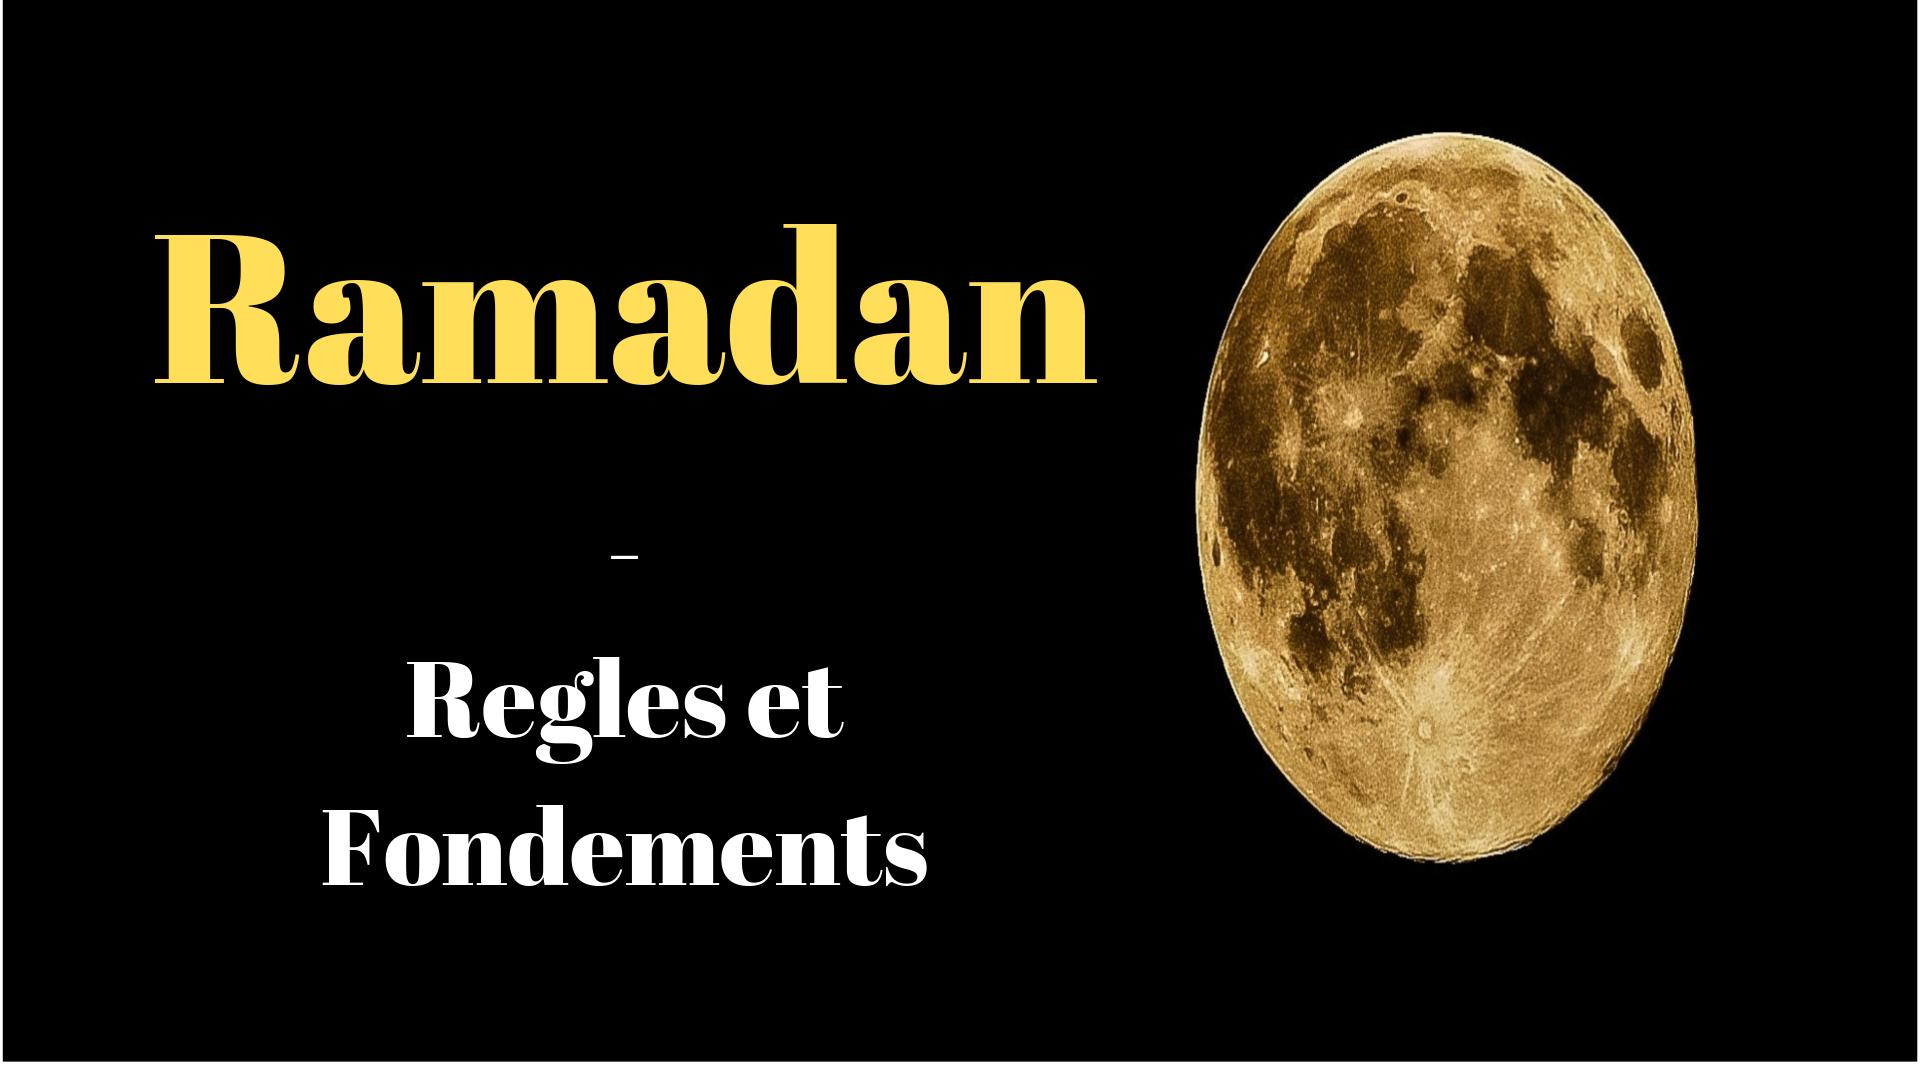 Ramadan - Regles et Fondements